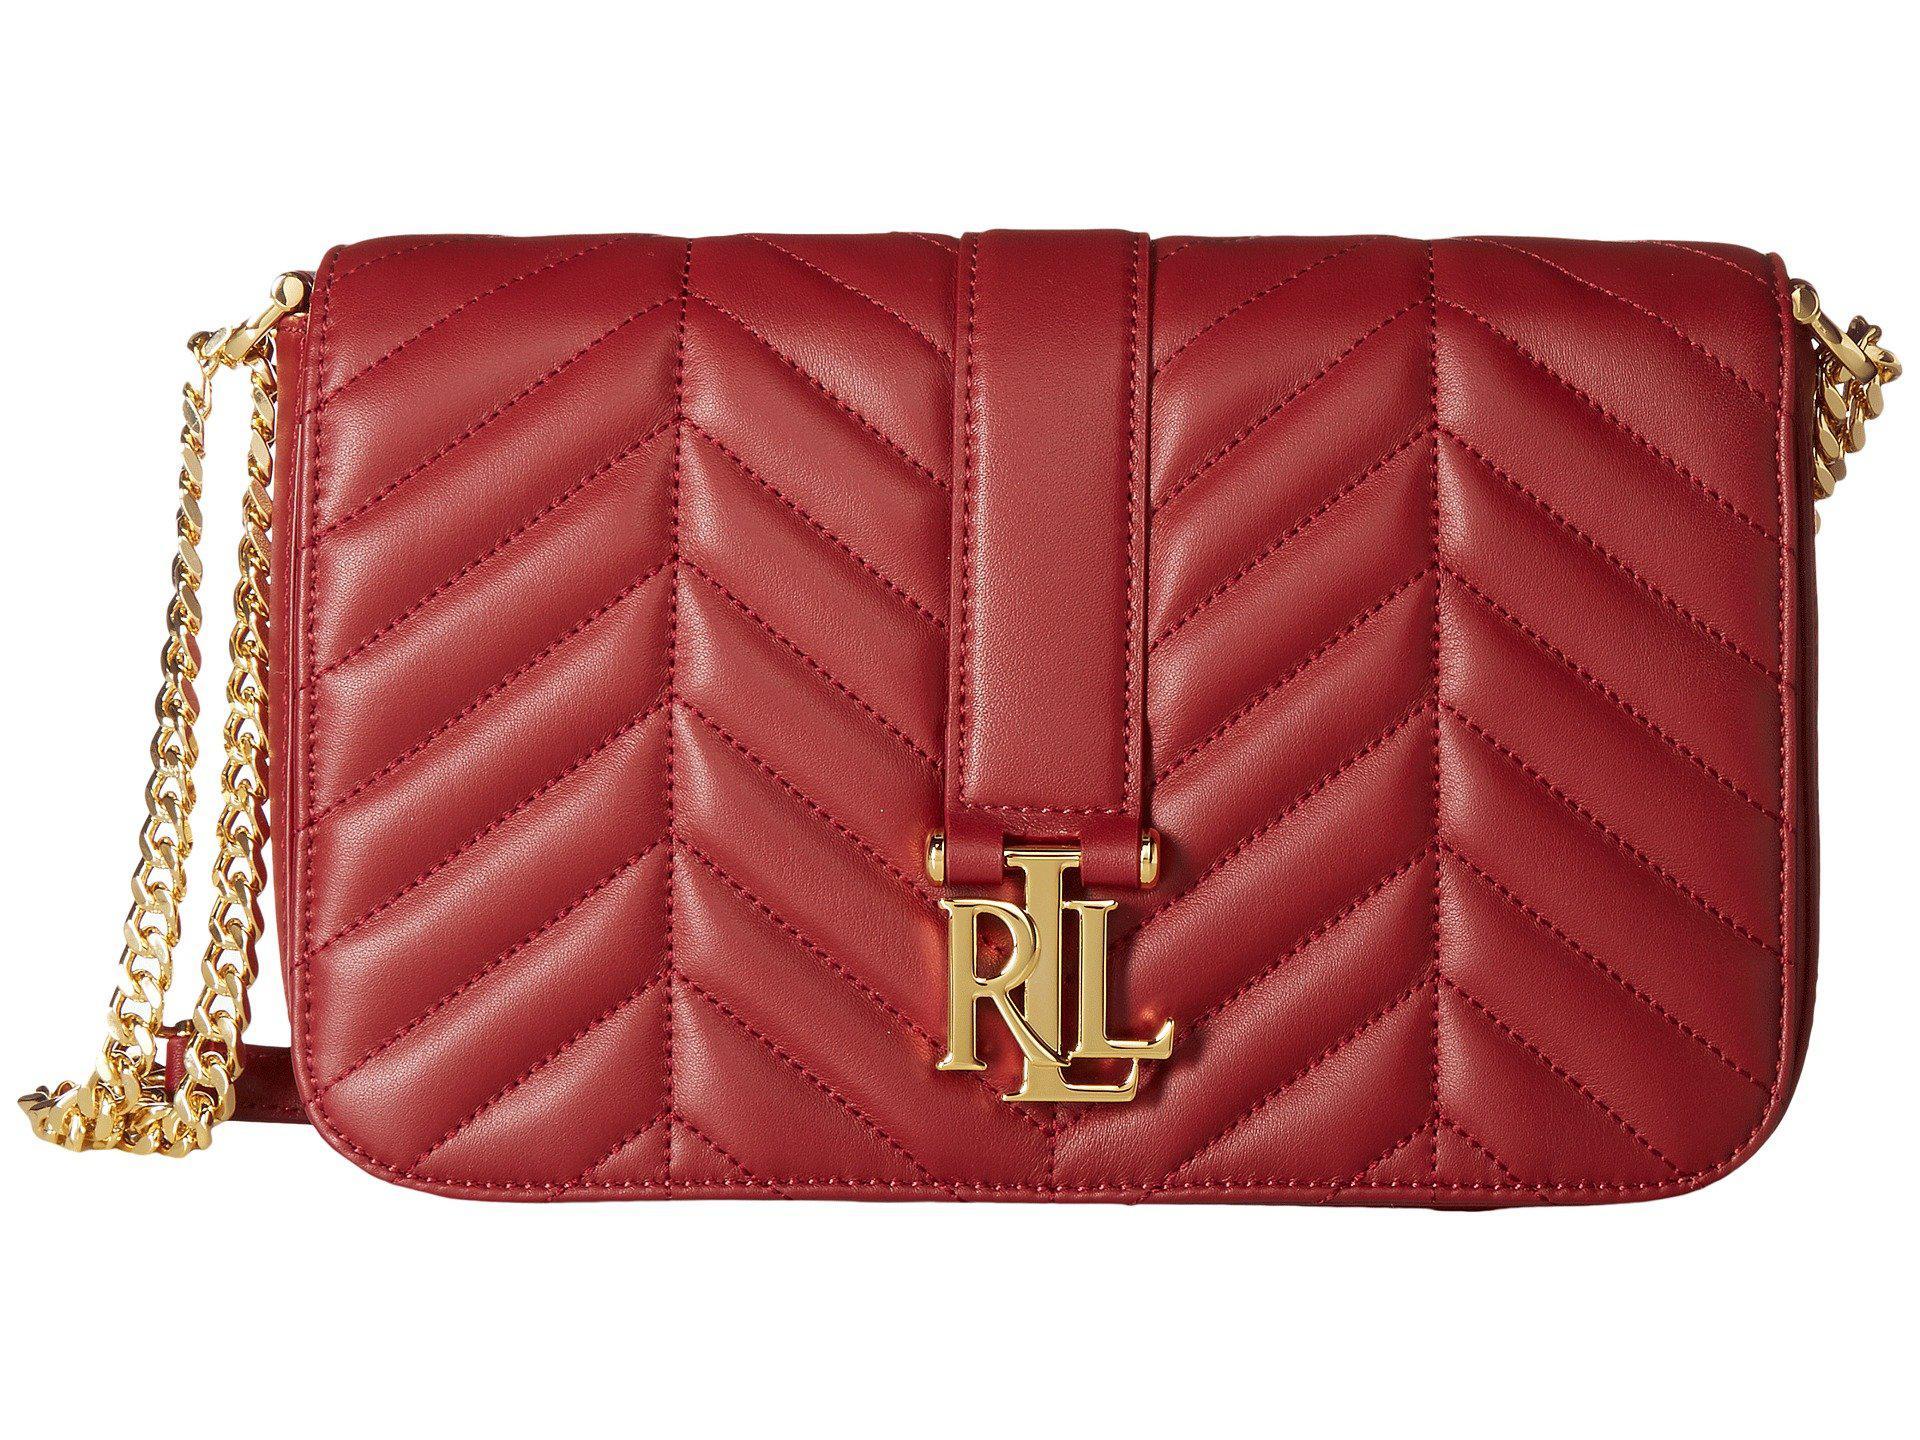 929e5d3d270 Lyst - Lauren by Ralph Lauren Carrington Brenda Medium Shoulder in Red